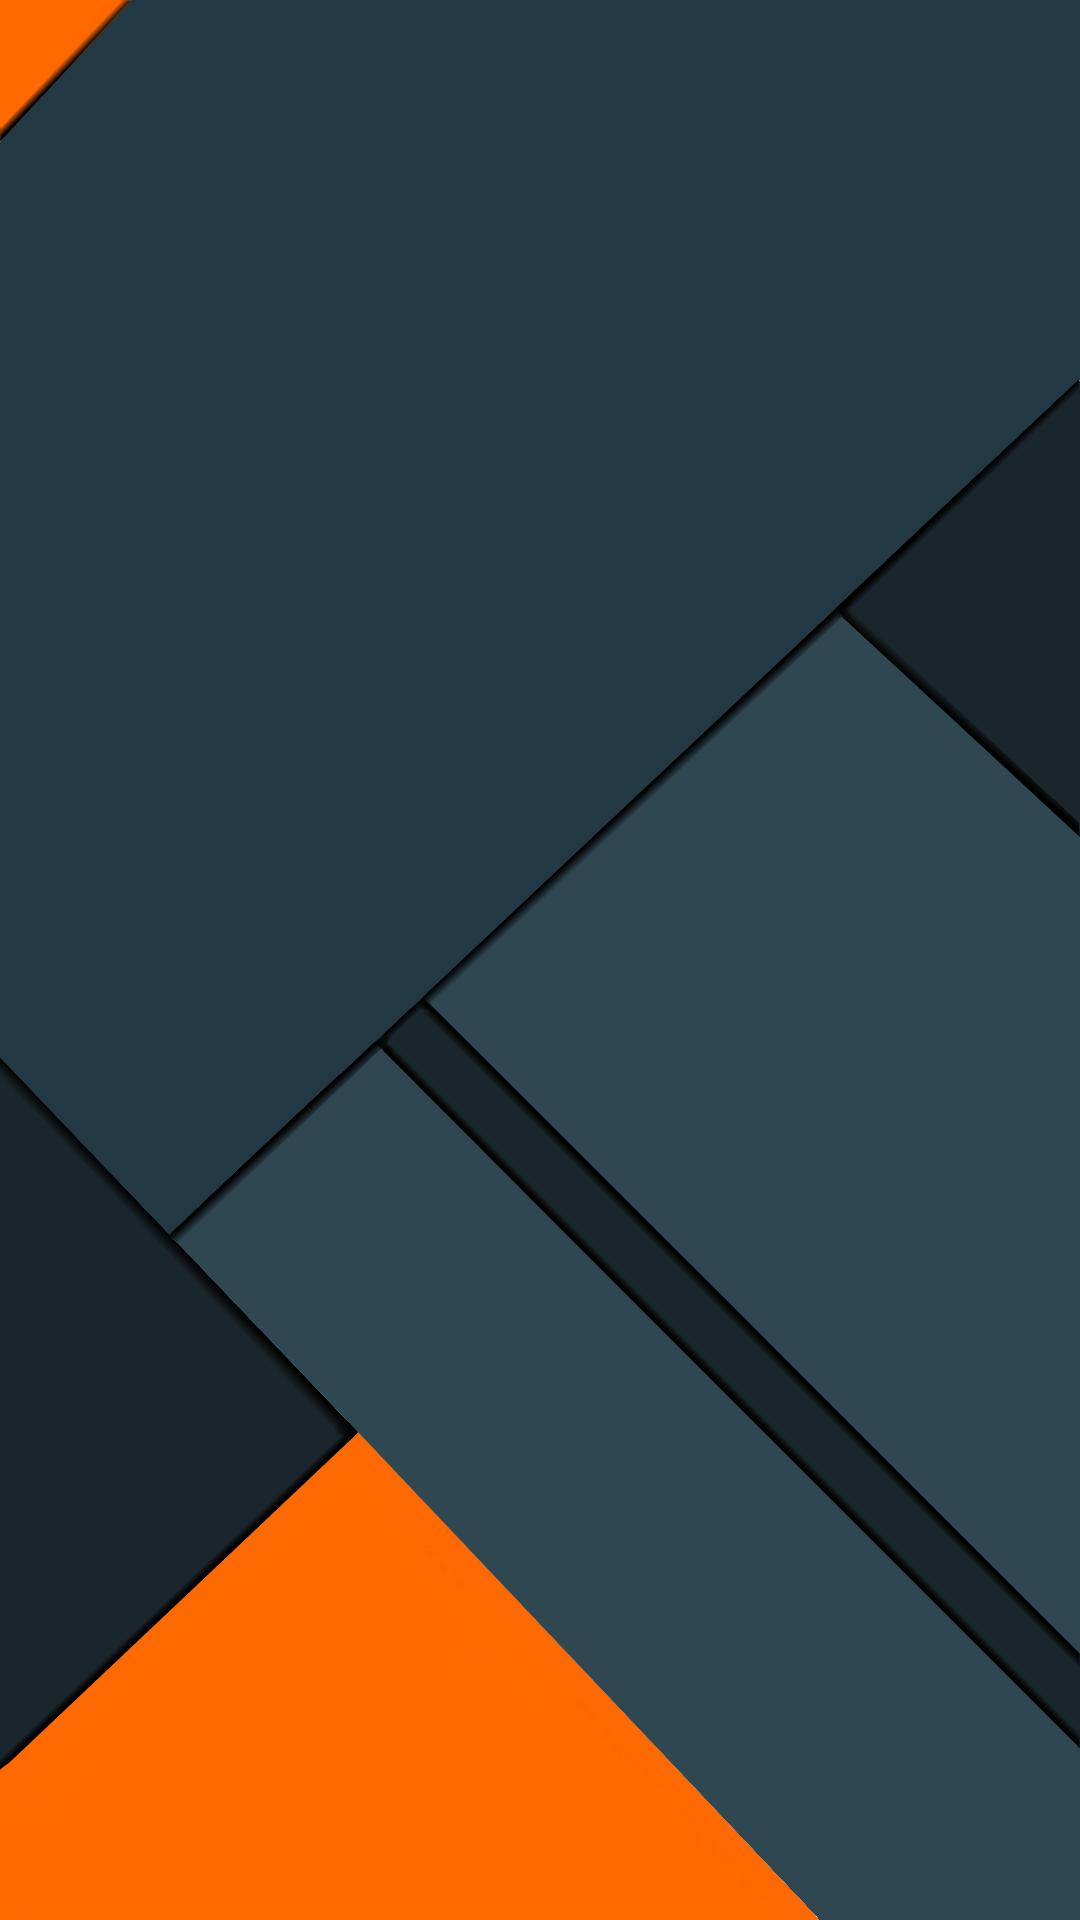 Mobile Wallpaper FullHD By YoIncauto On DeviantArt